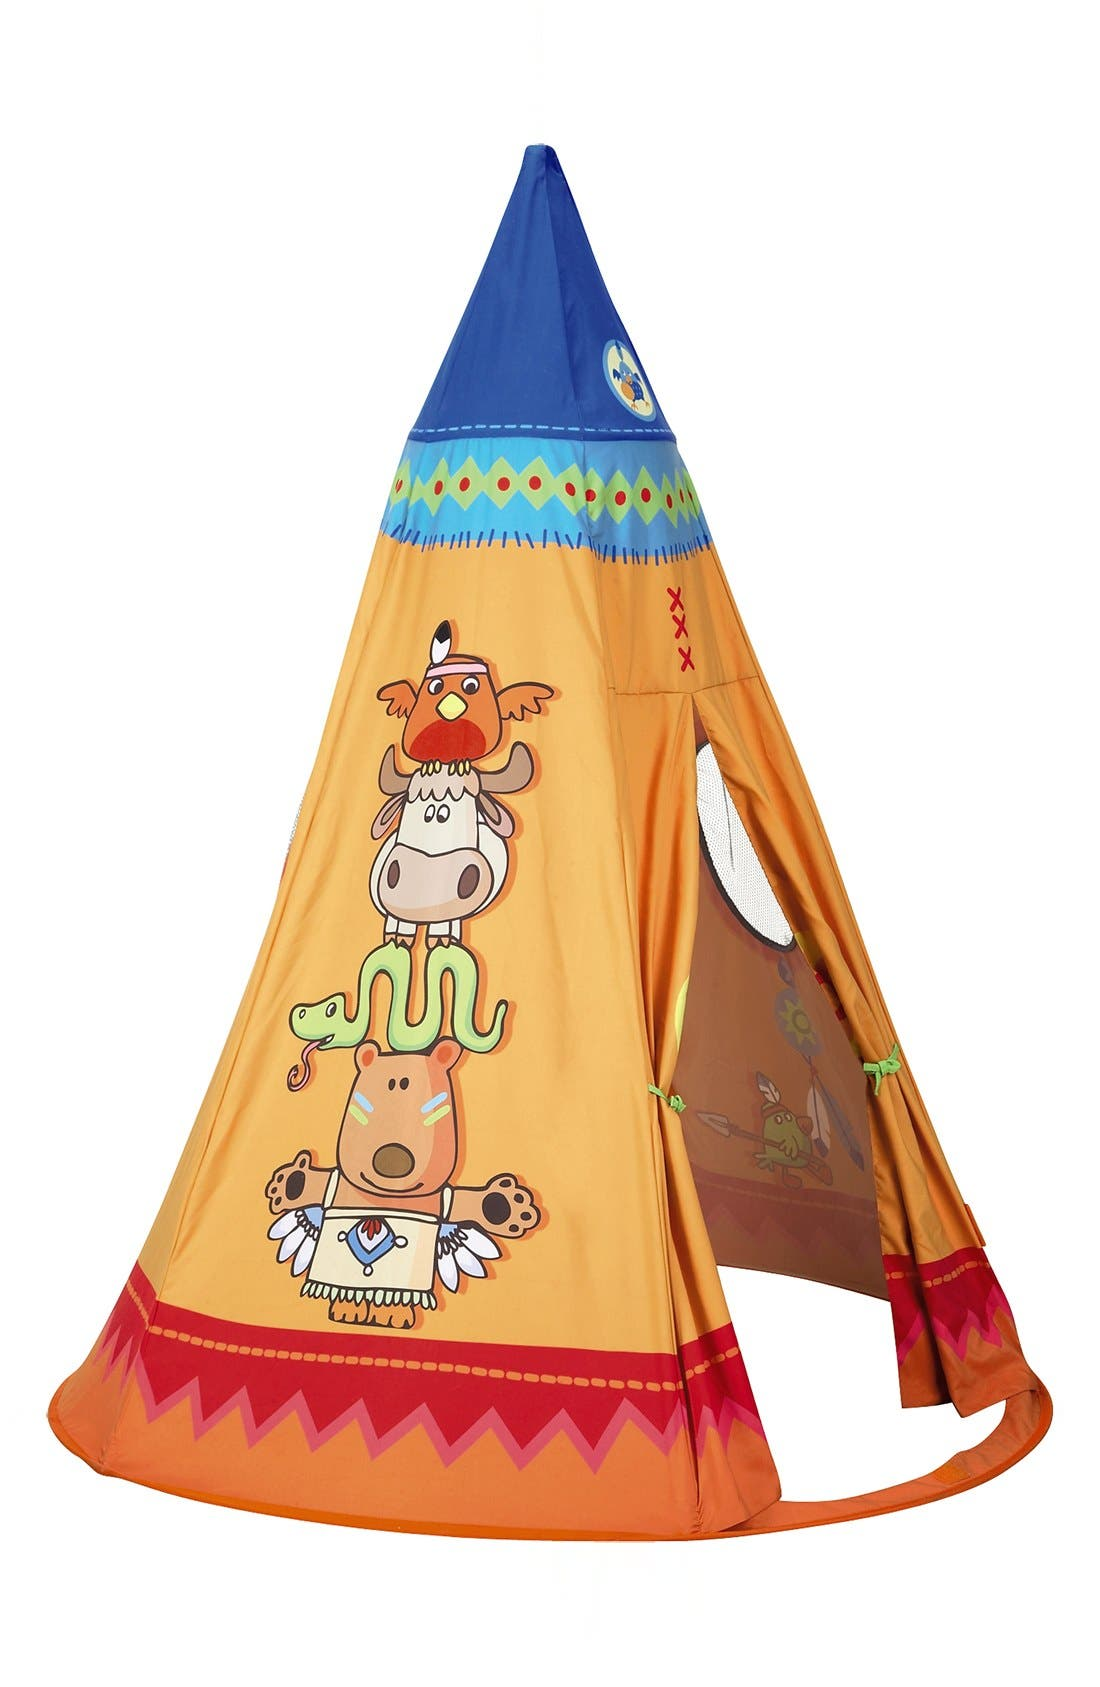 HABA 'Tepee' Play Tent